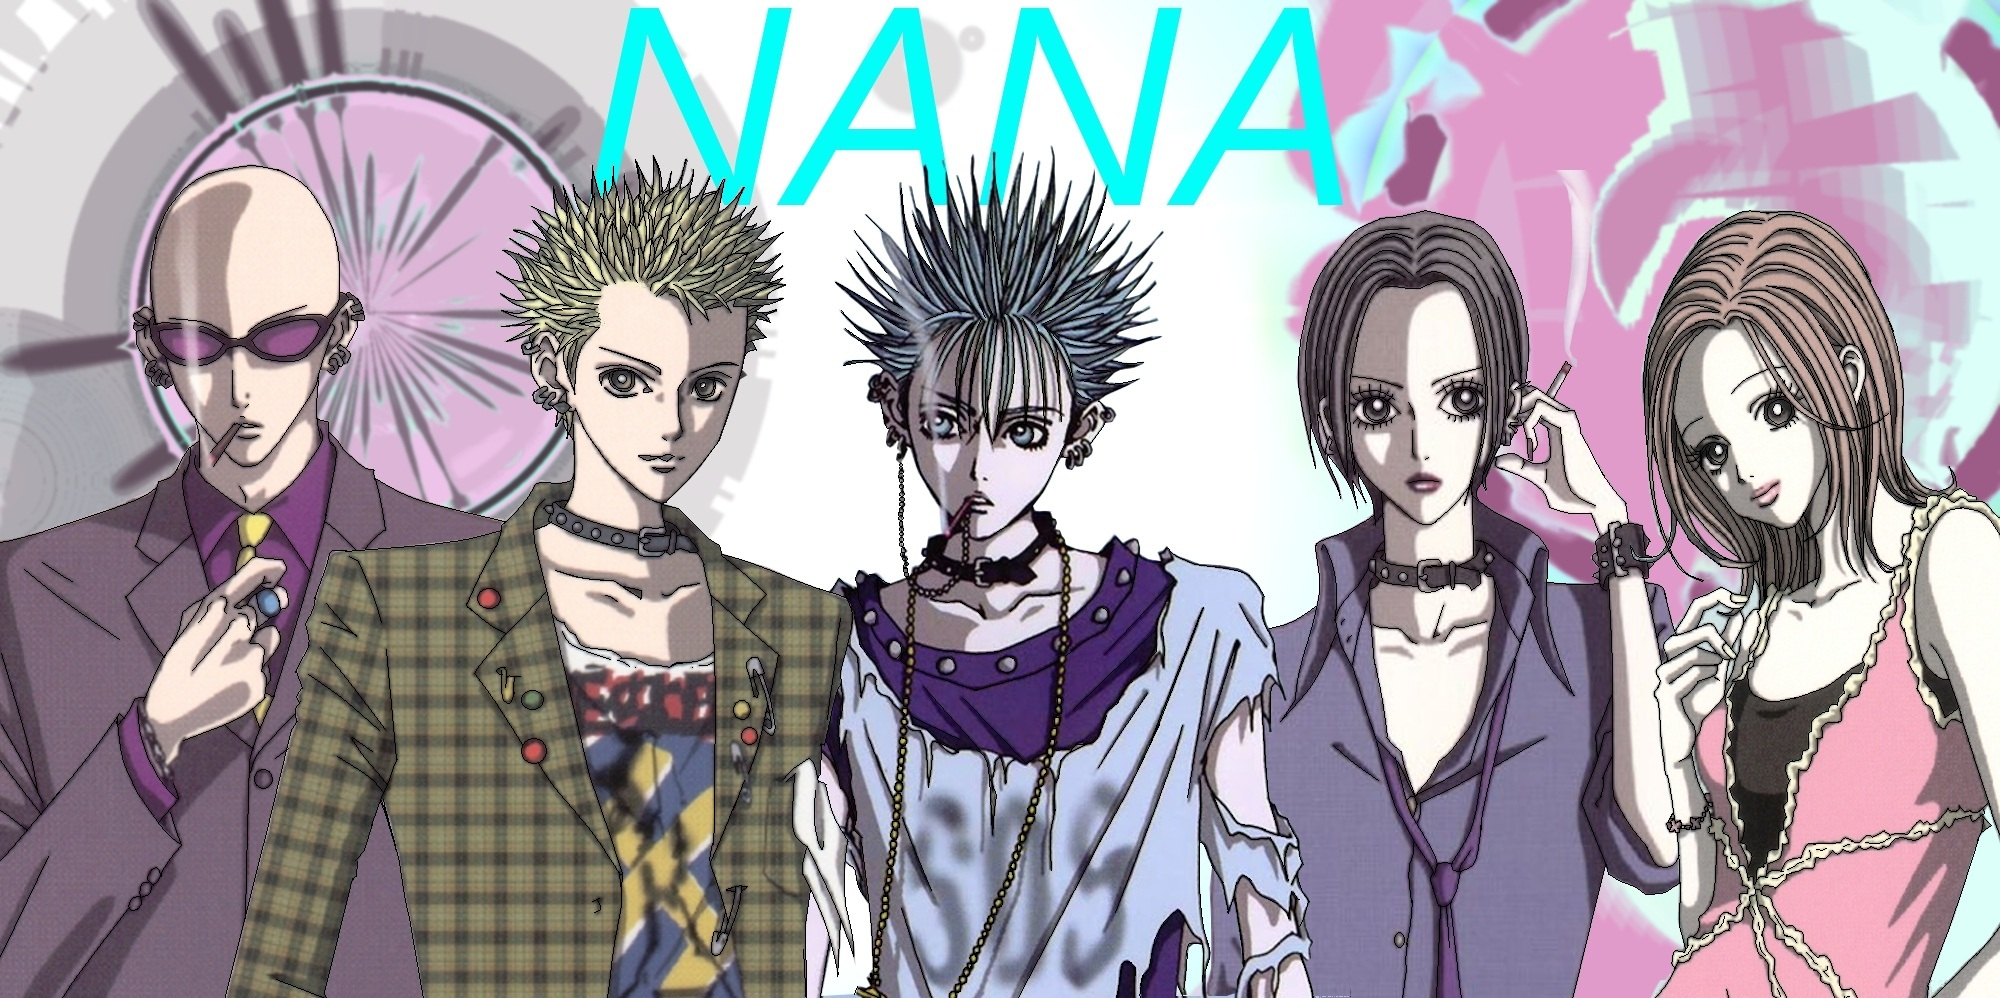 nana wallpaper by kagomaruxx on deviantart